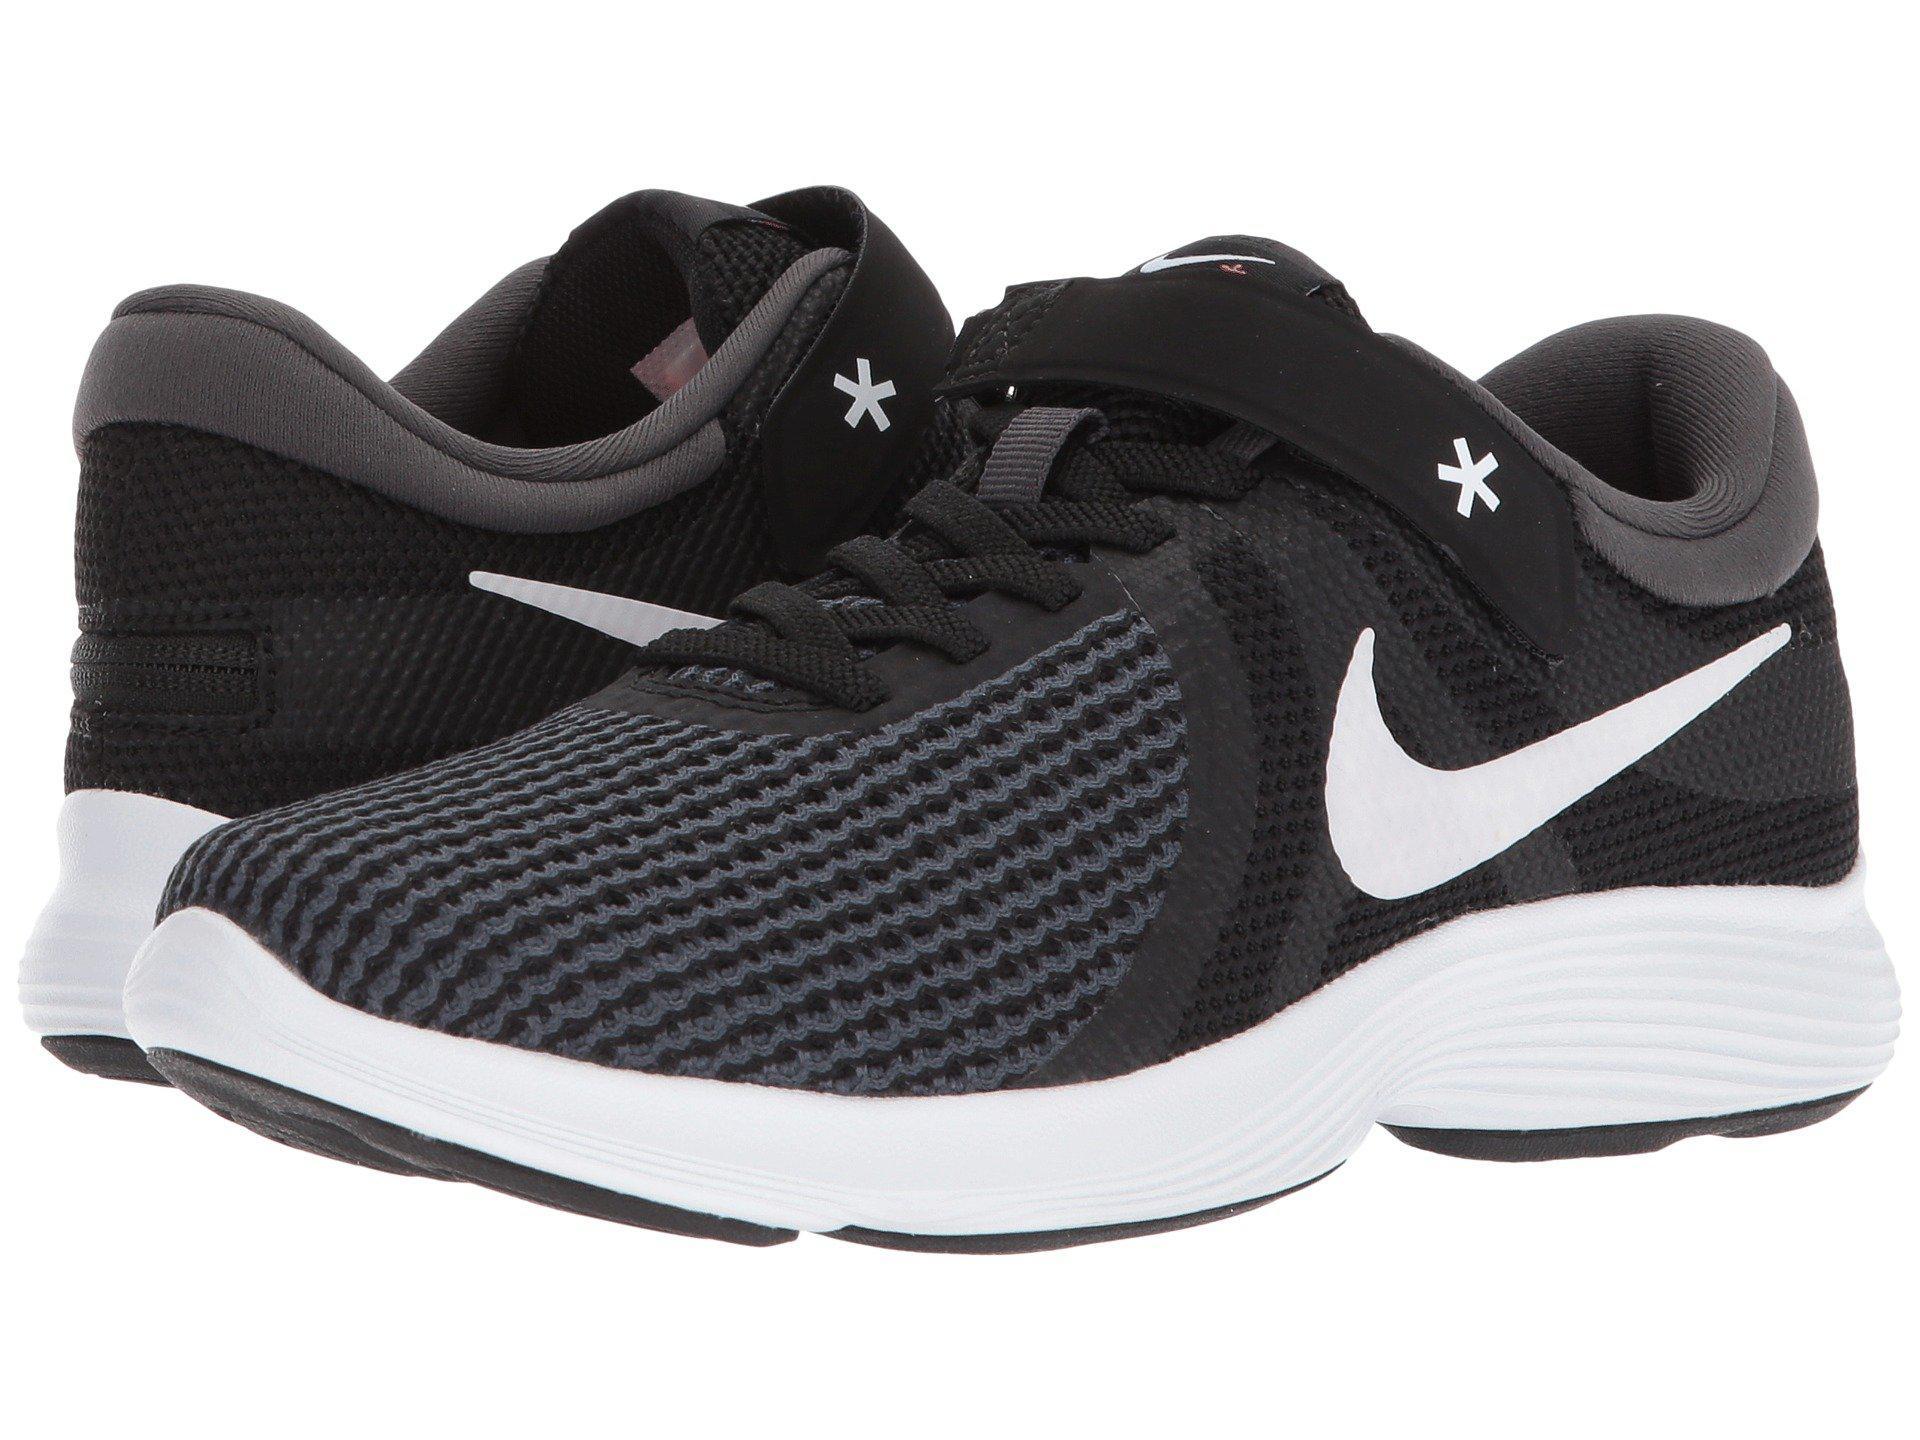 watch 54fb1 b3994 ... Lyst - Nike Revolution 4 Flyease in Black for Men ...